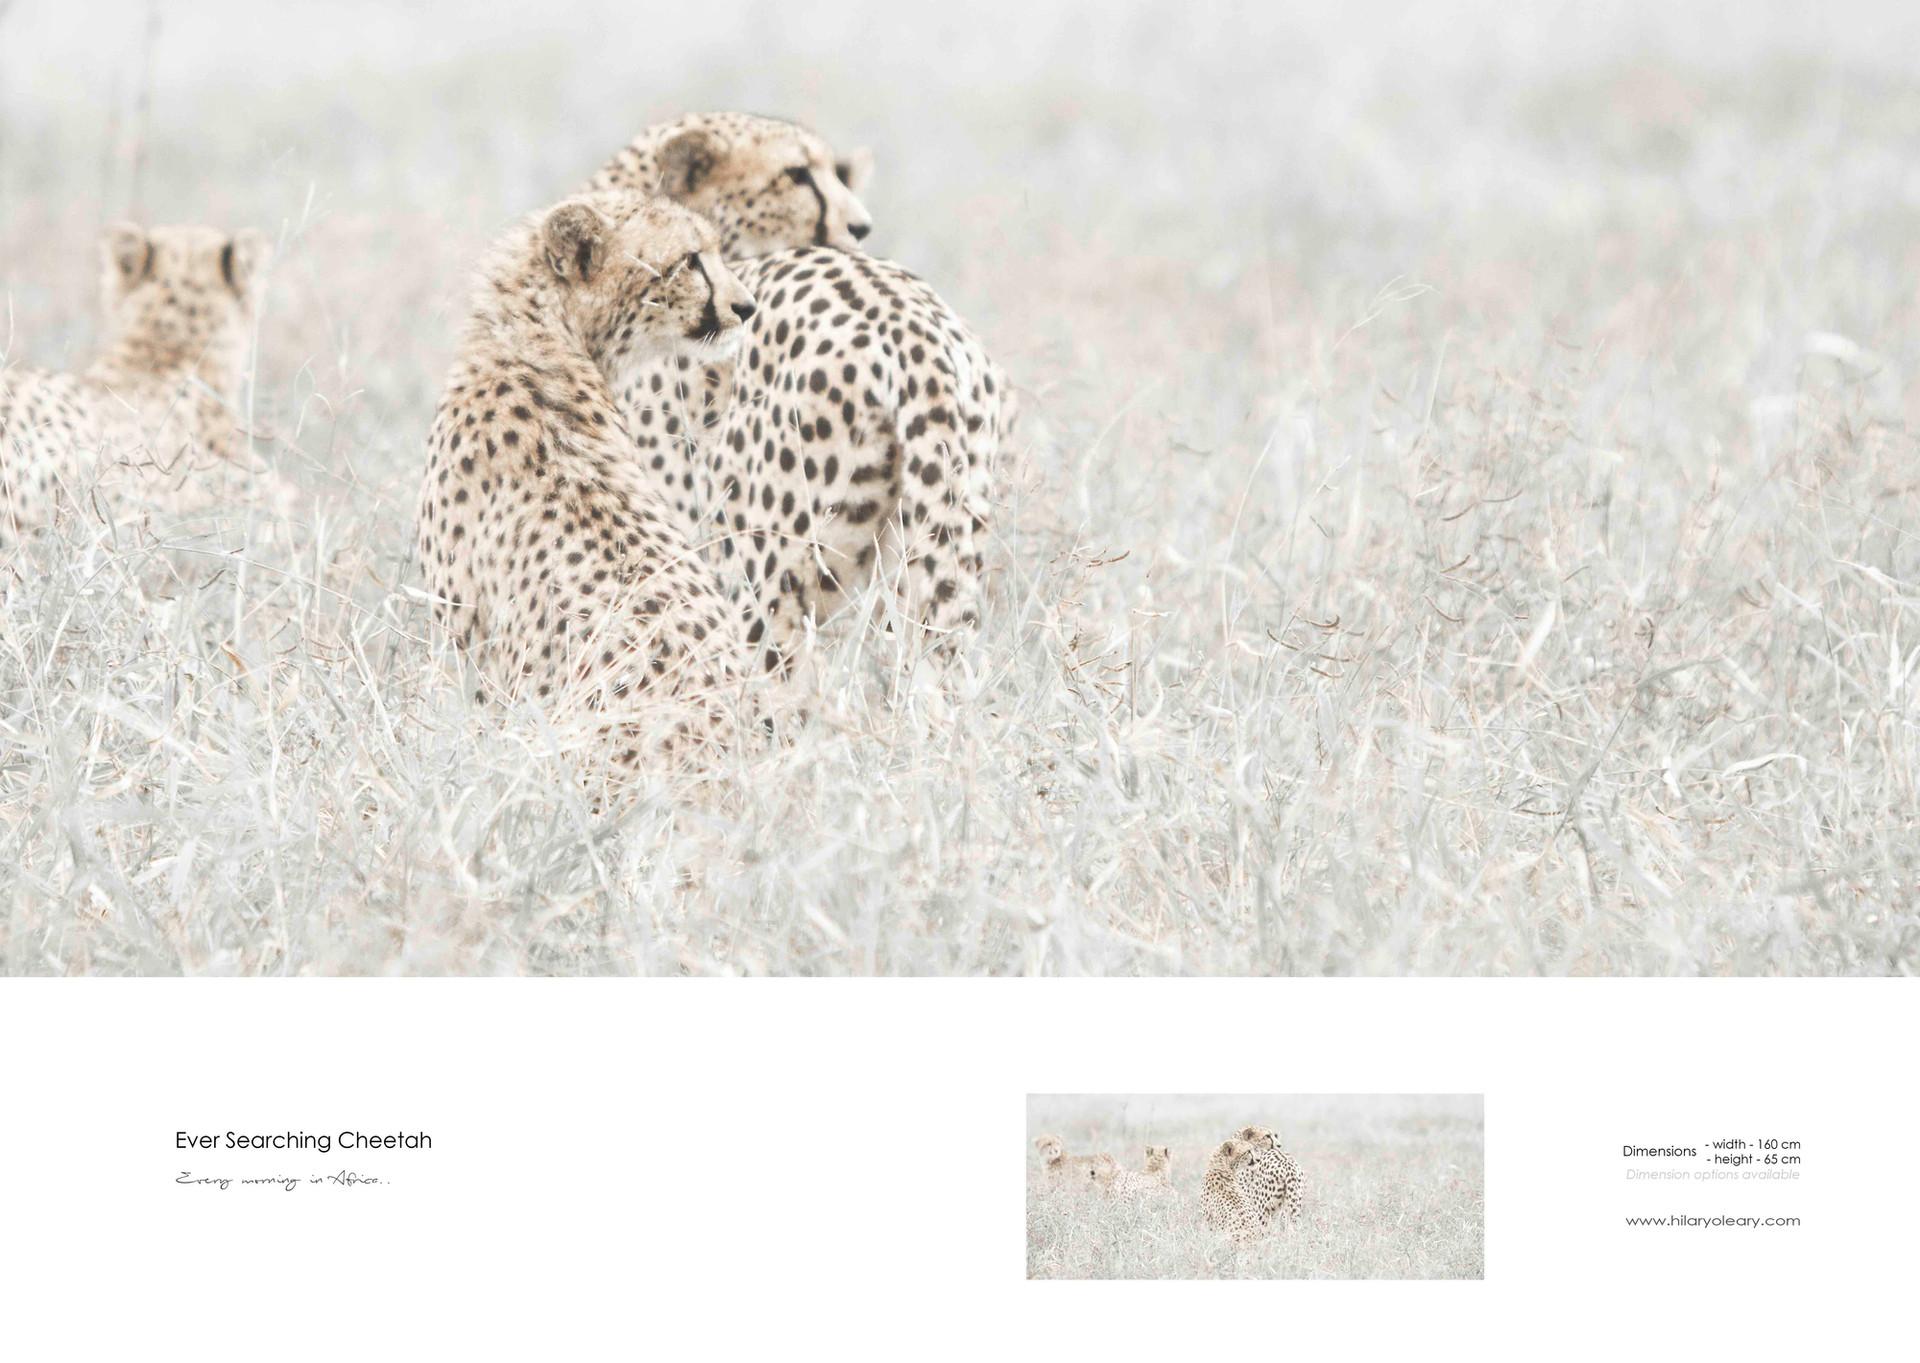 41 Ever searching cheetah.jpg